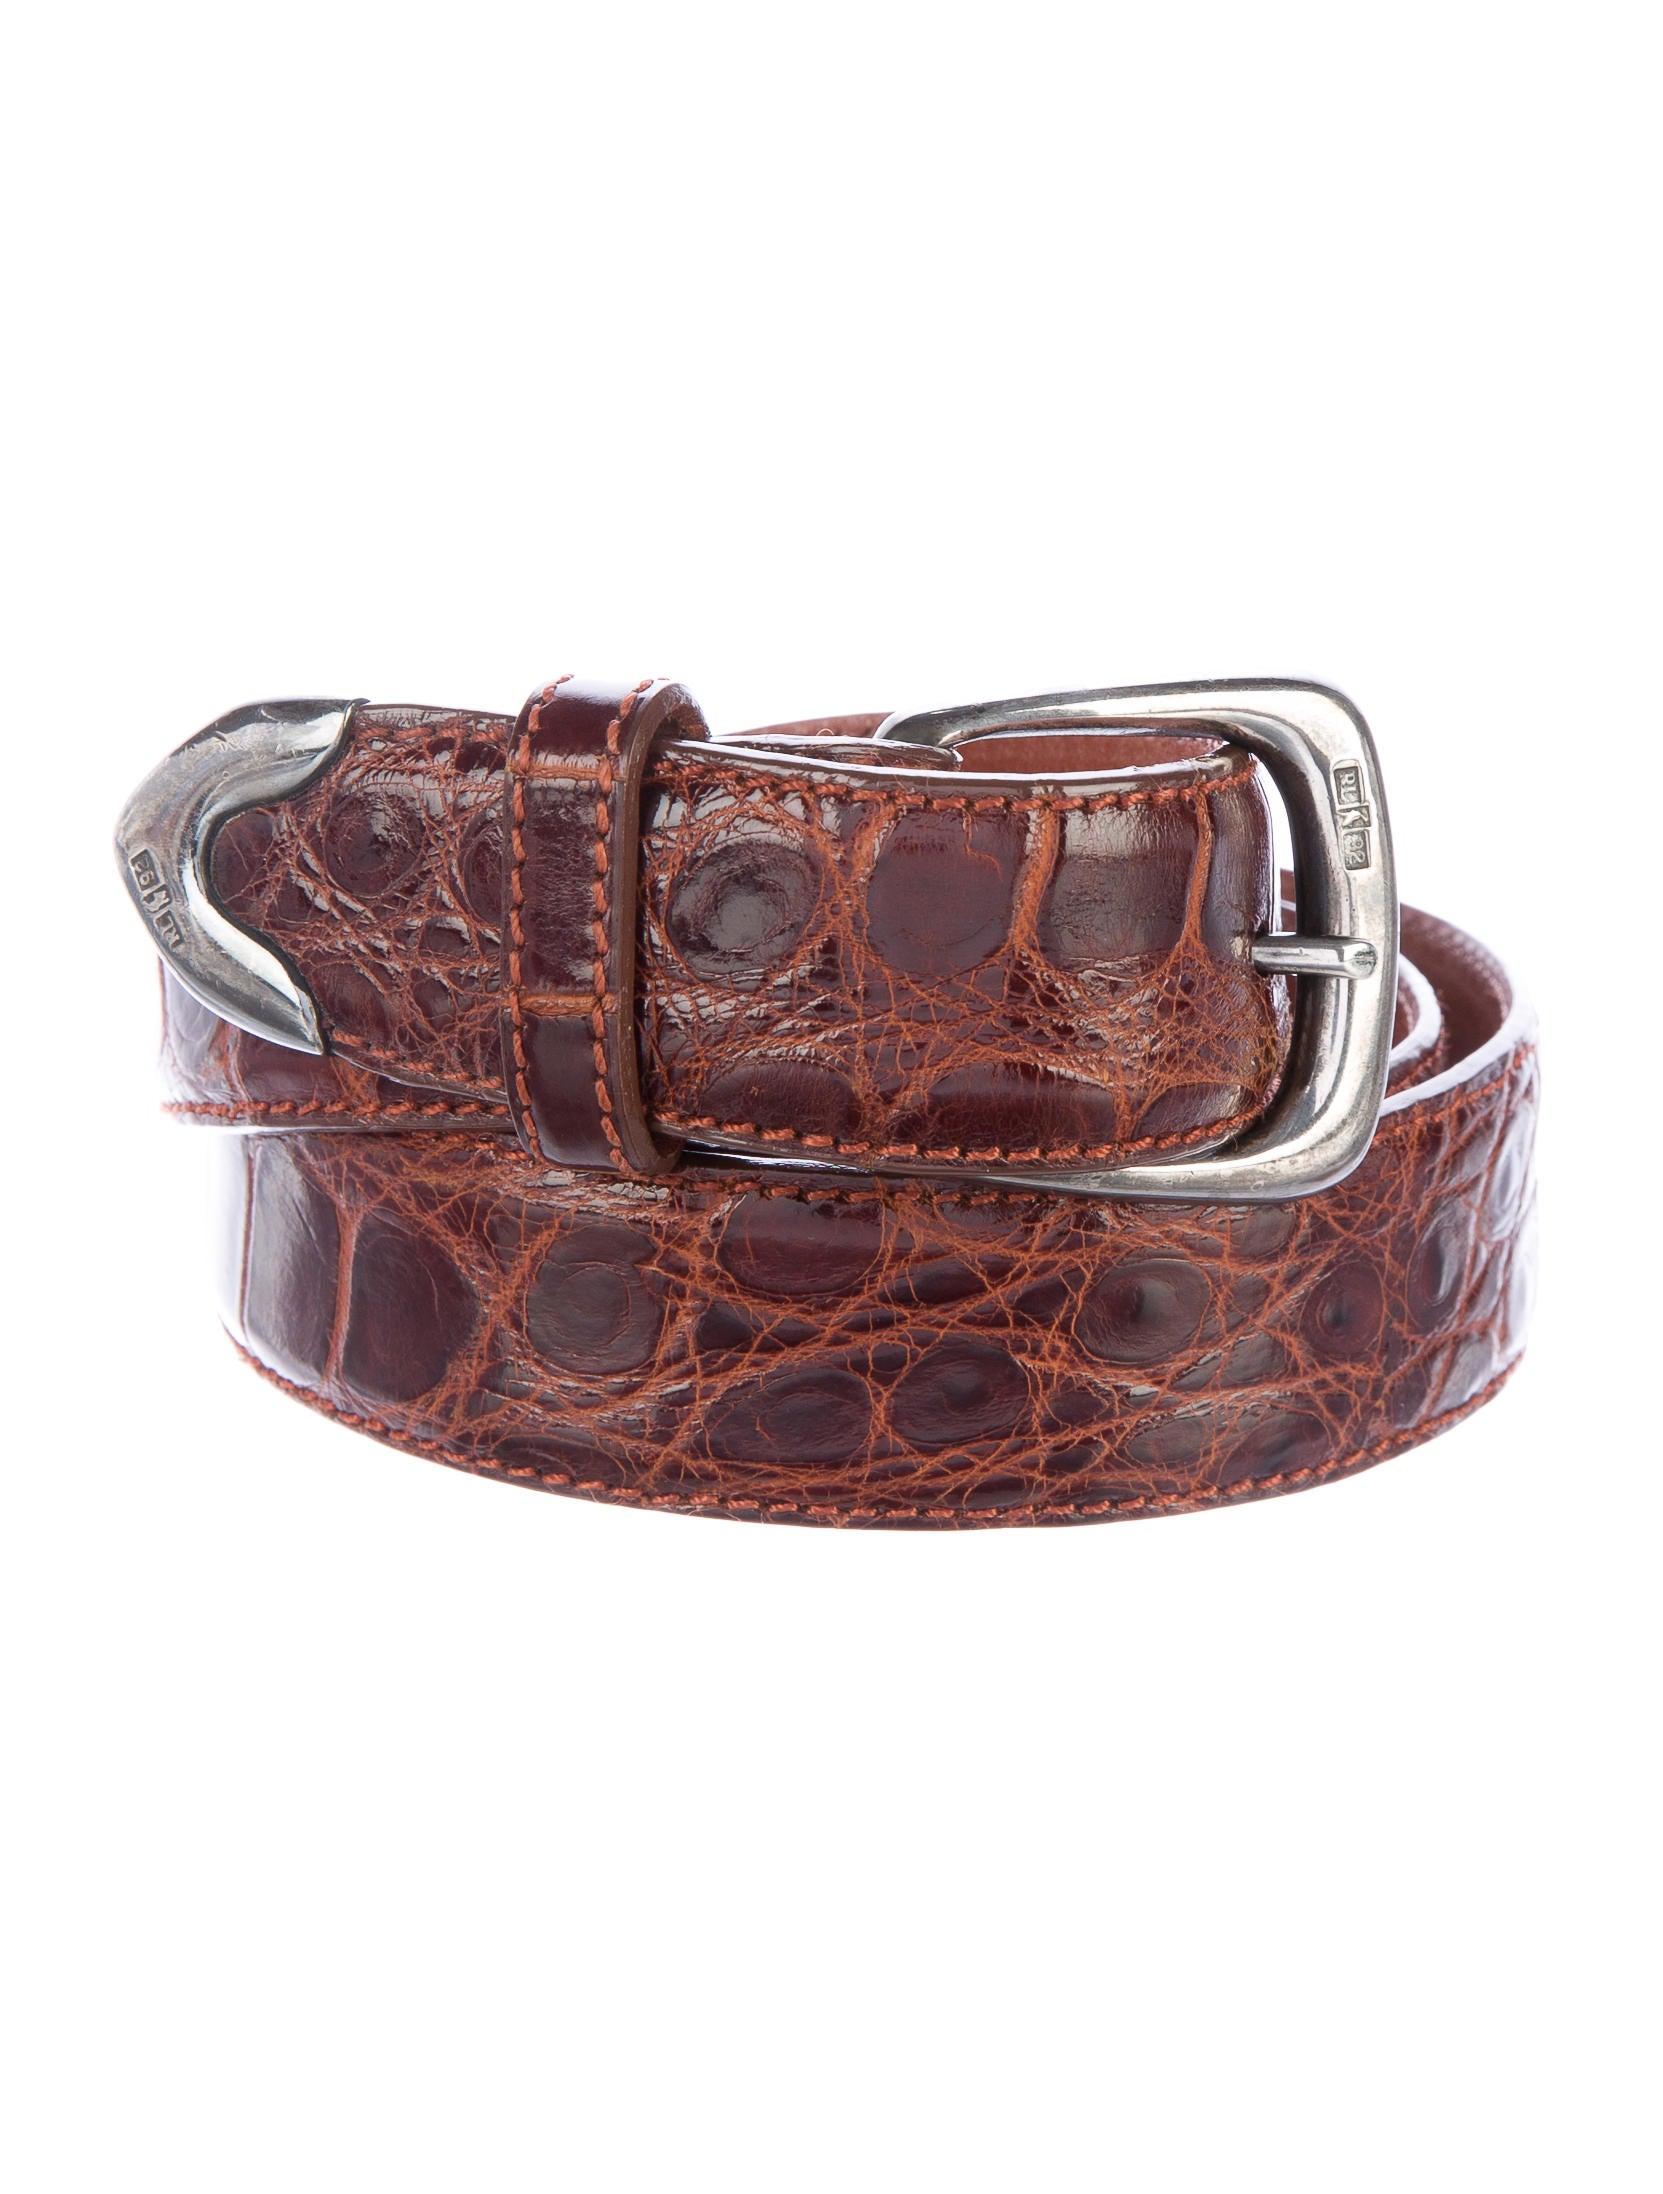 polo ralph lauren aligator skin belt accessories. Black Bedroom Furniture Sets. Home Design Ideas